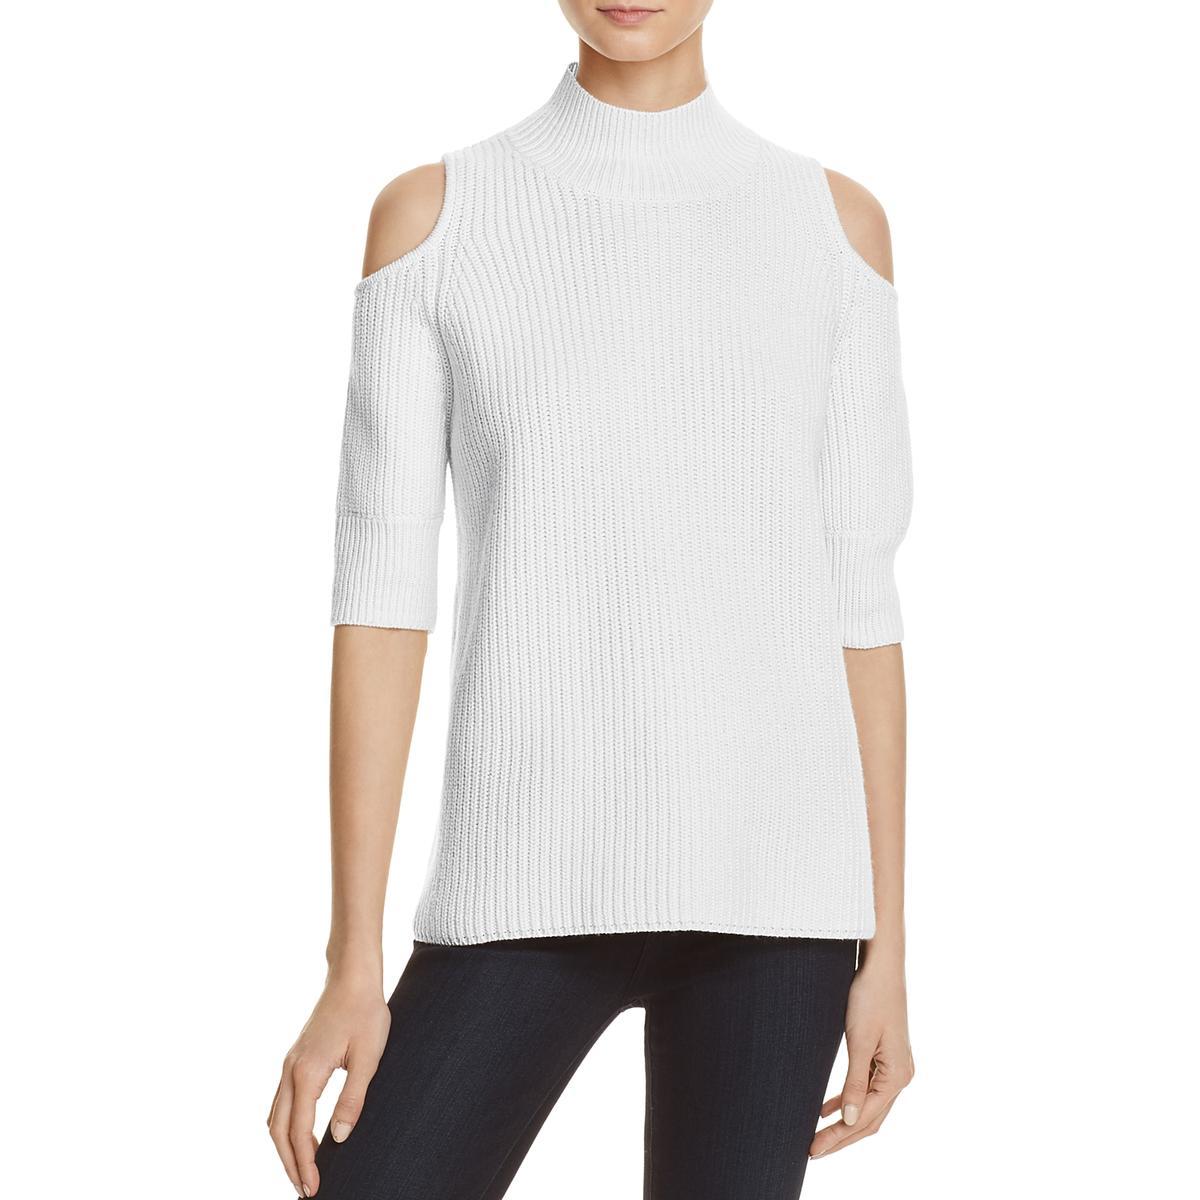 67f878e224 Details about Zoe Jordan Womens White Cold Shoulder Knit Mock Sweater  Sweater XS BHFO 7423